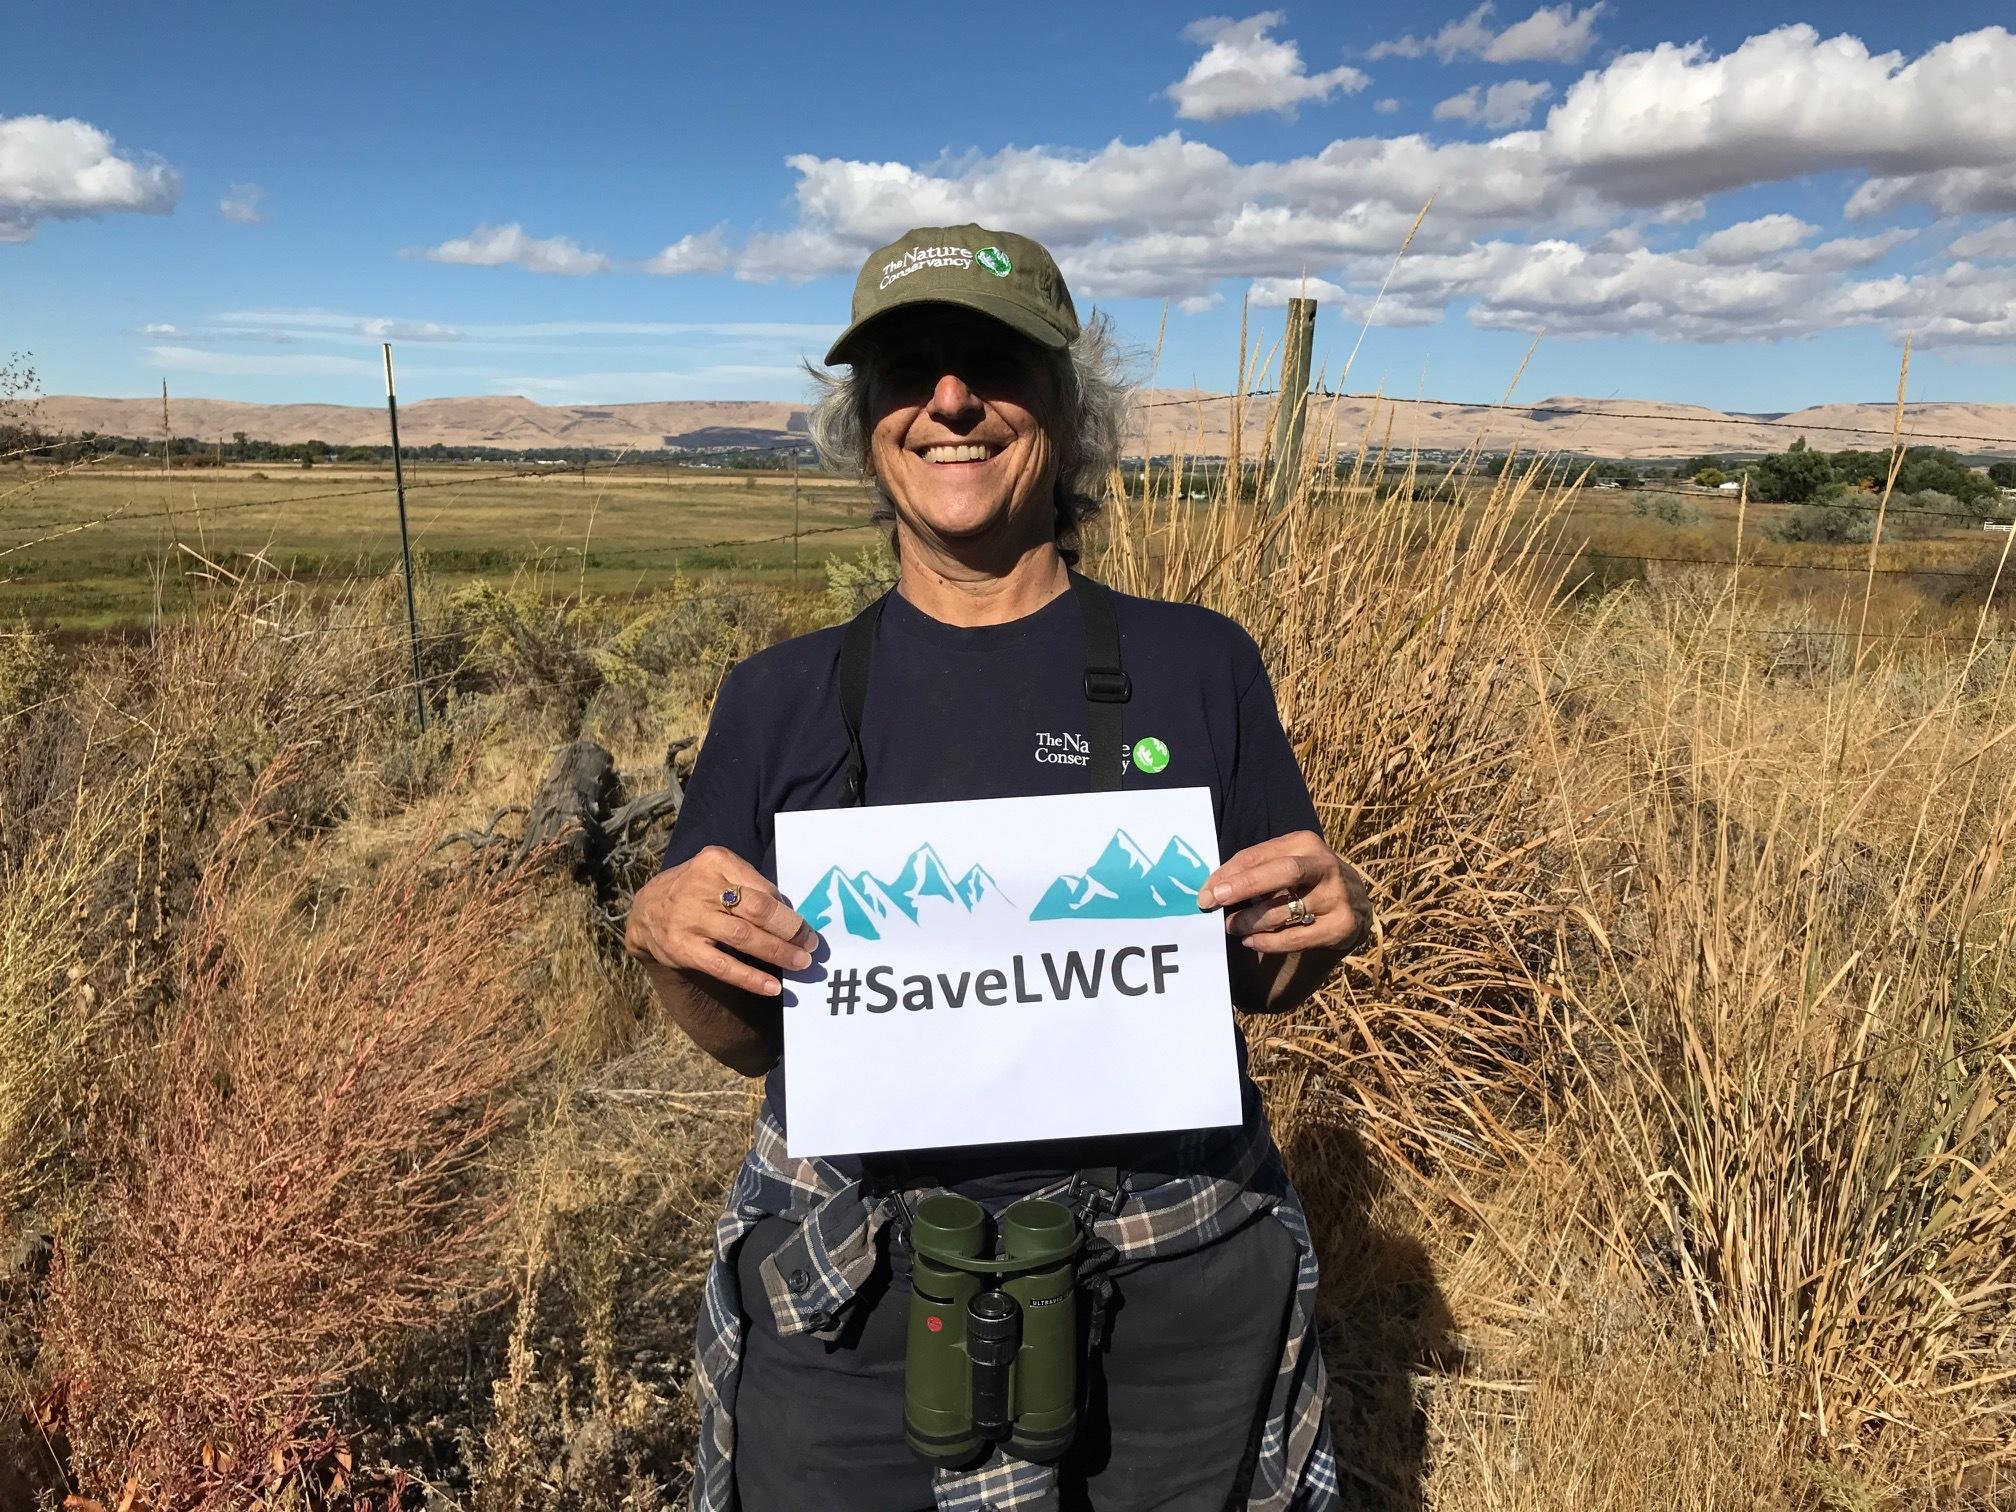 Yakima River Canyon Volunteer 5 by Randi Shaw.JPG